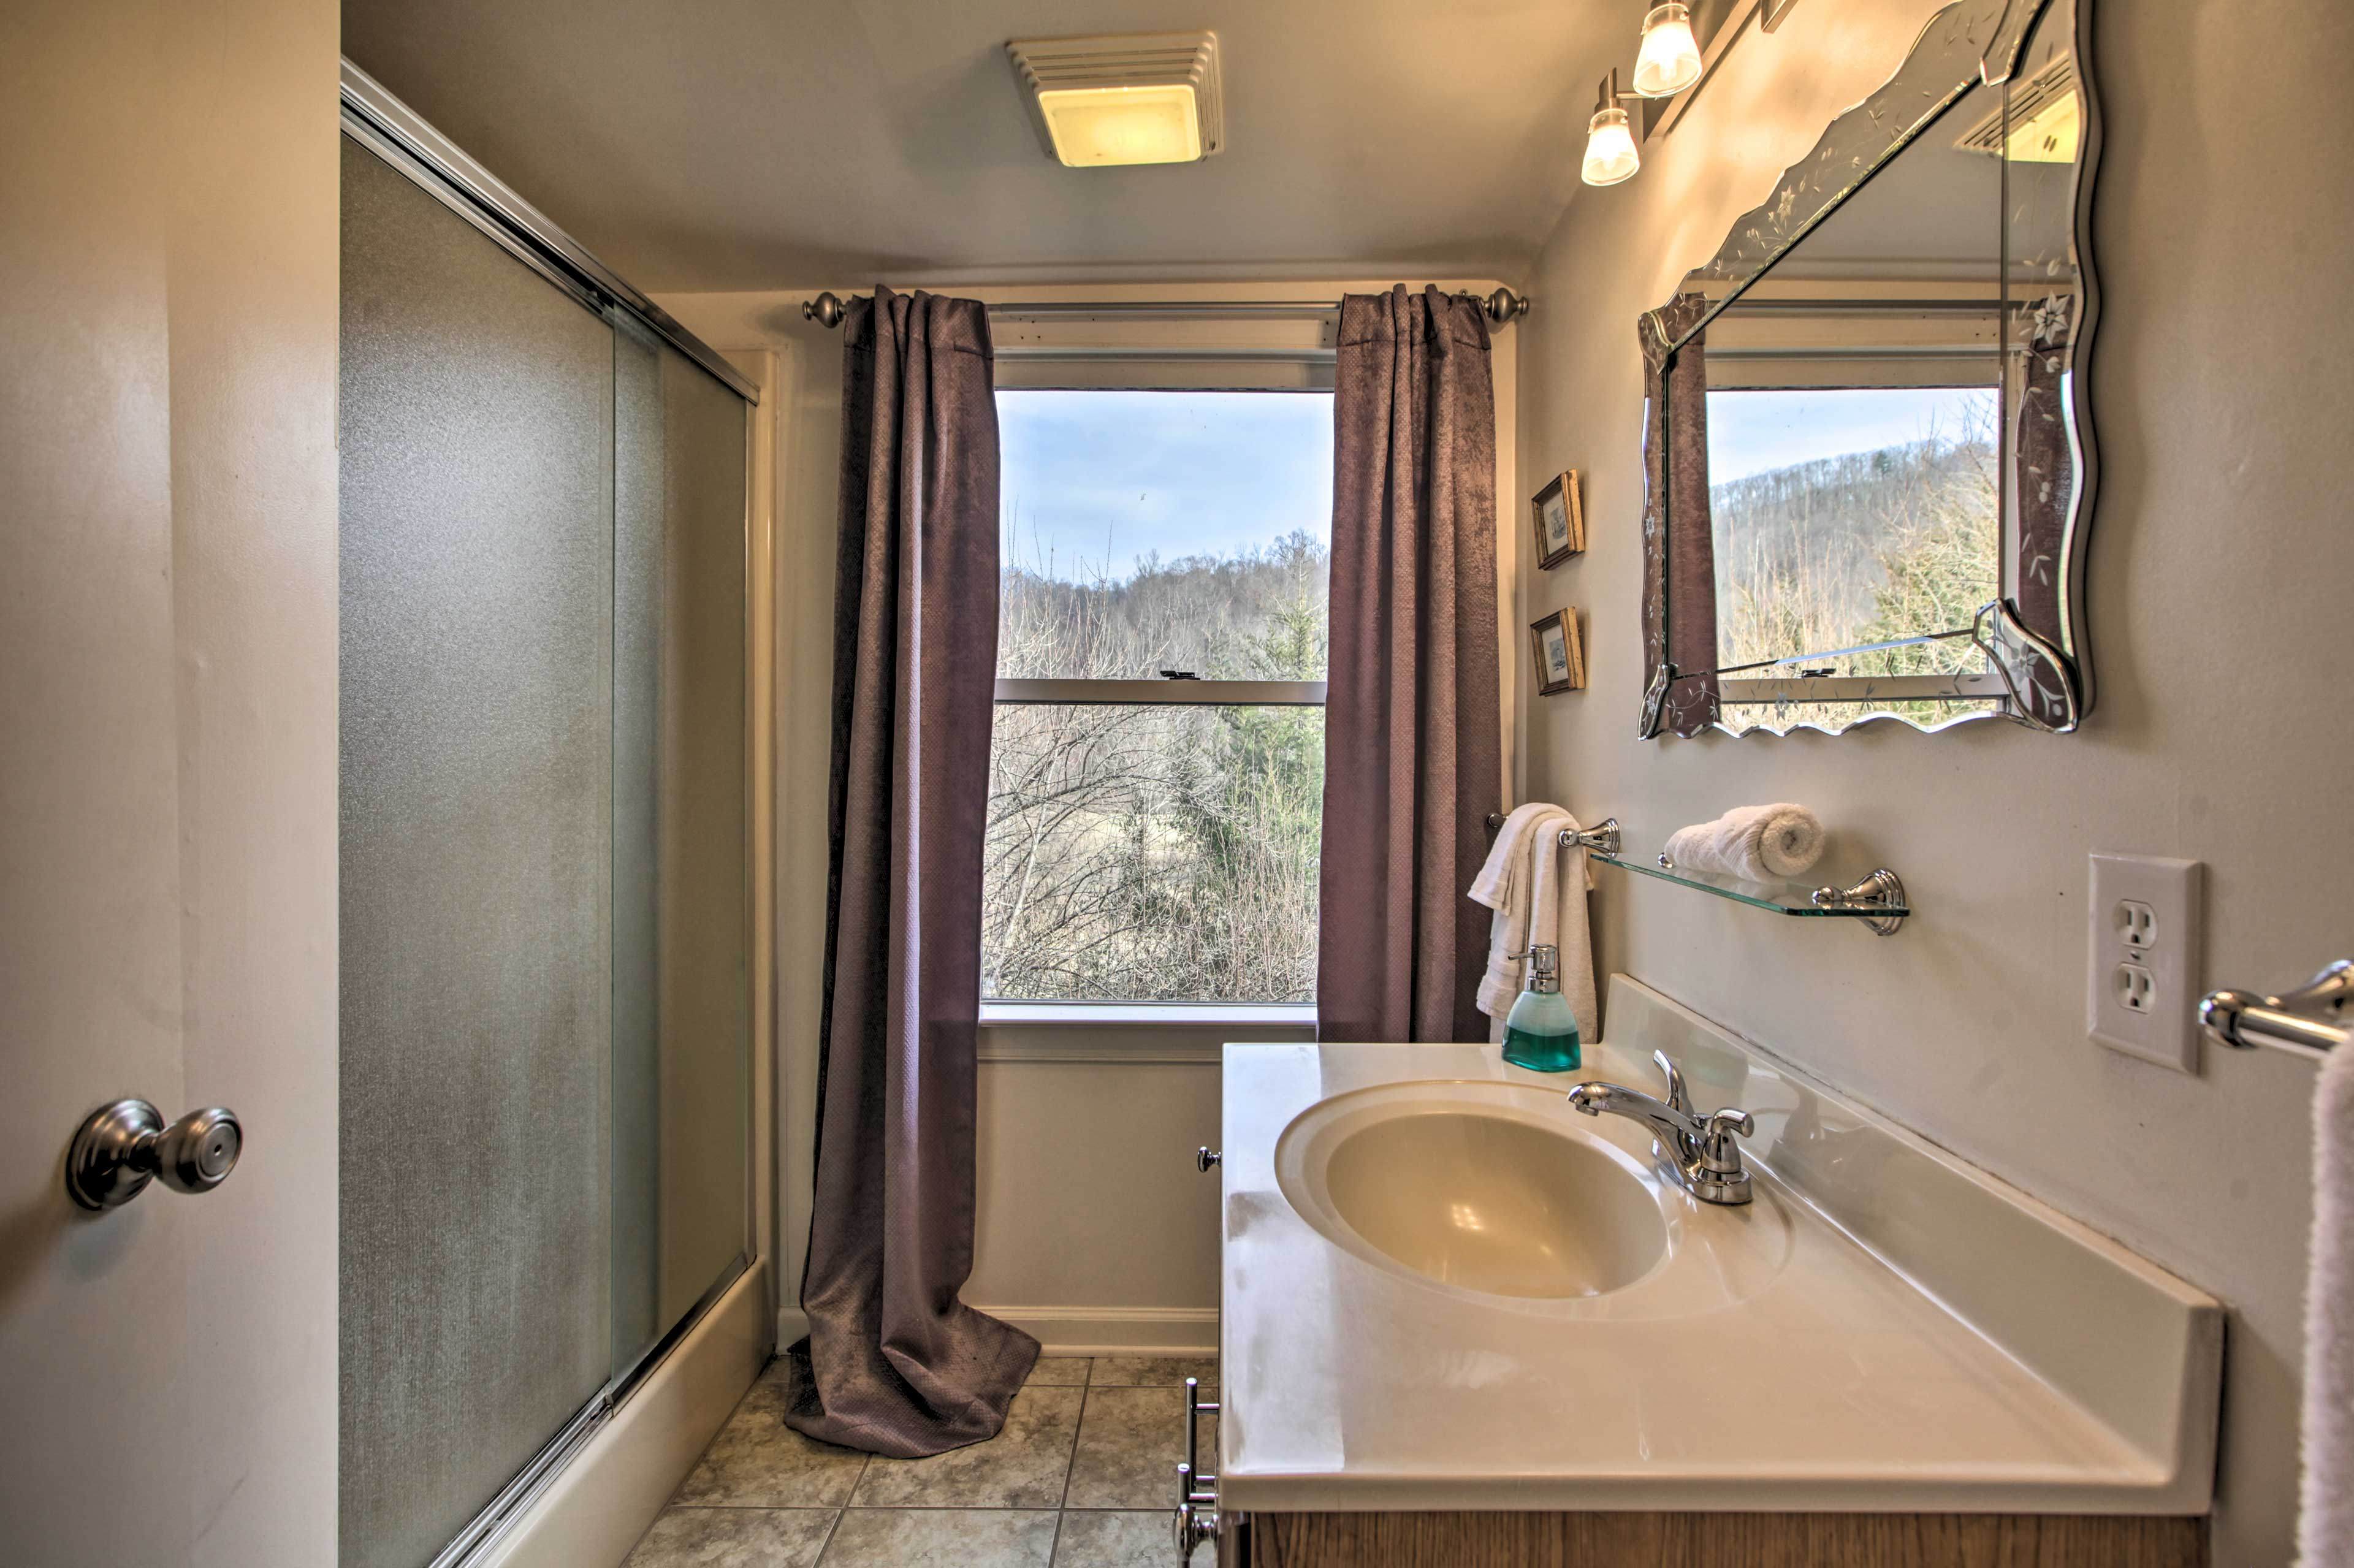 Bathroom | Complimentary Toiletries | Towels & Linens | Hair Dryer